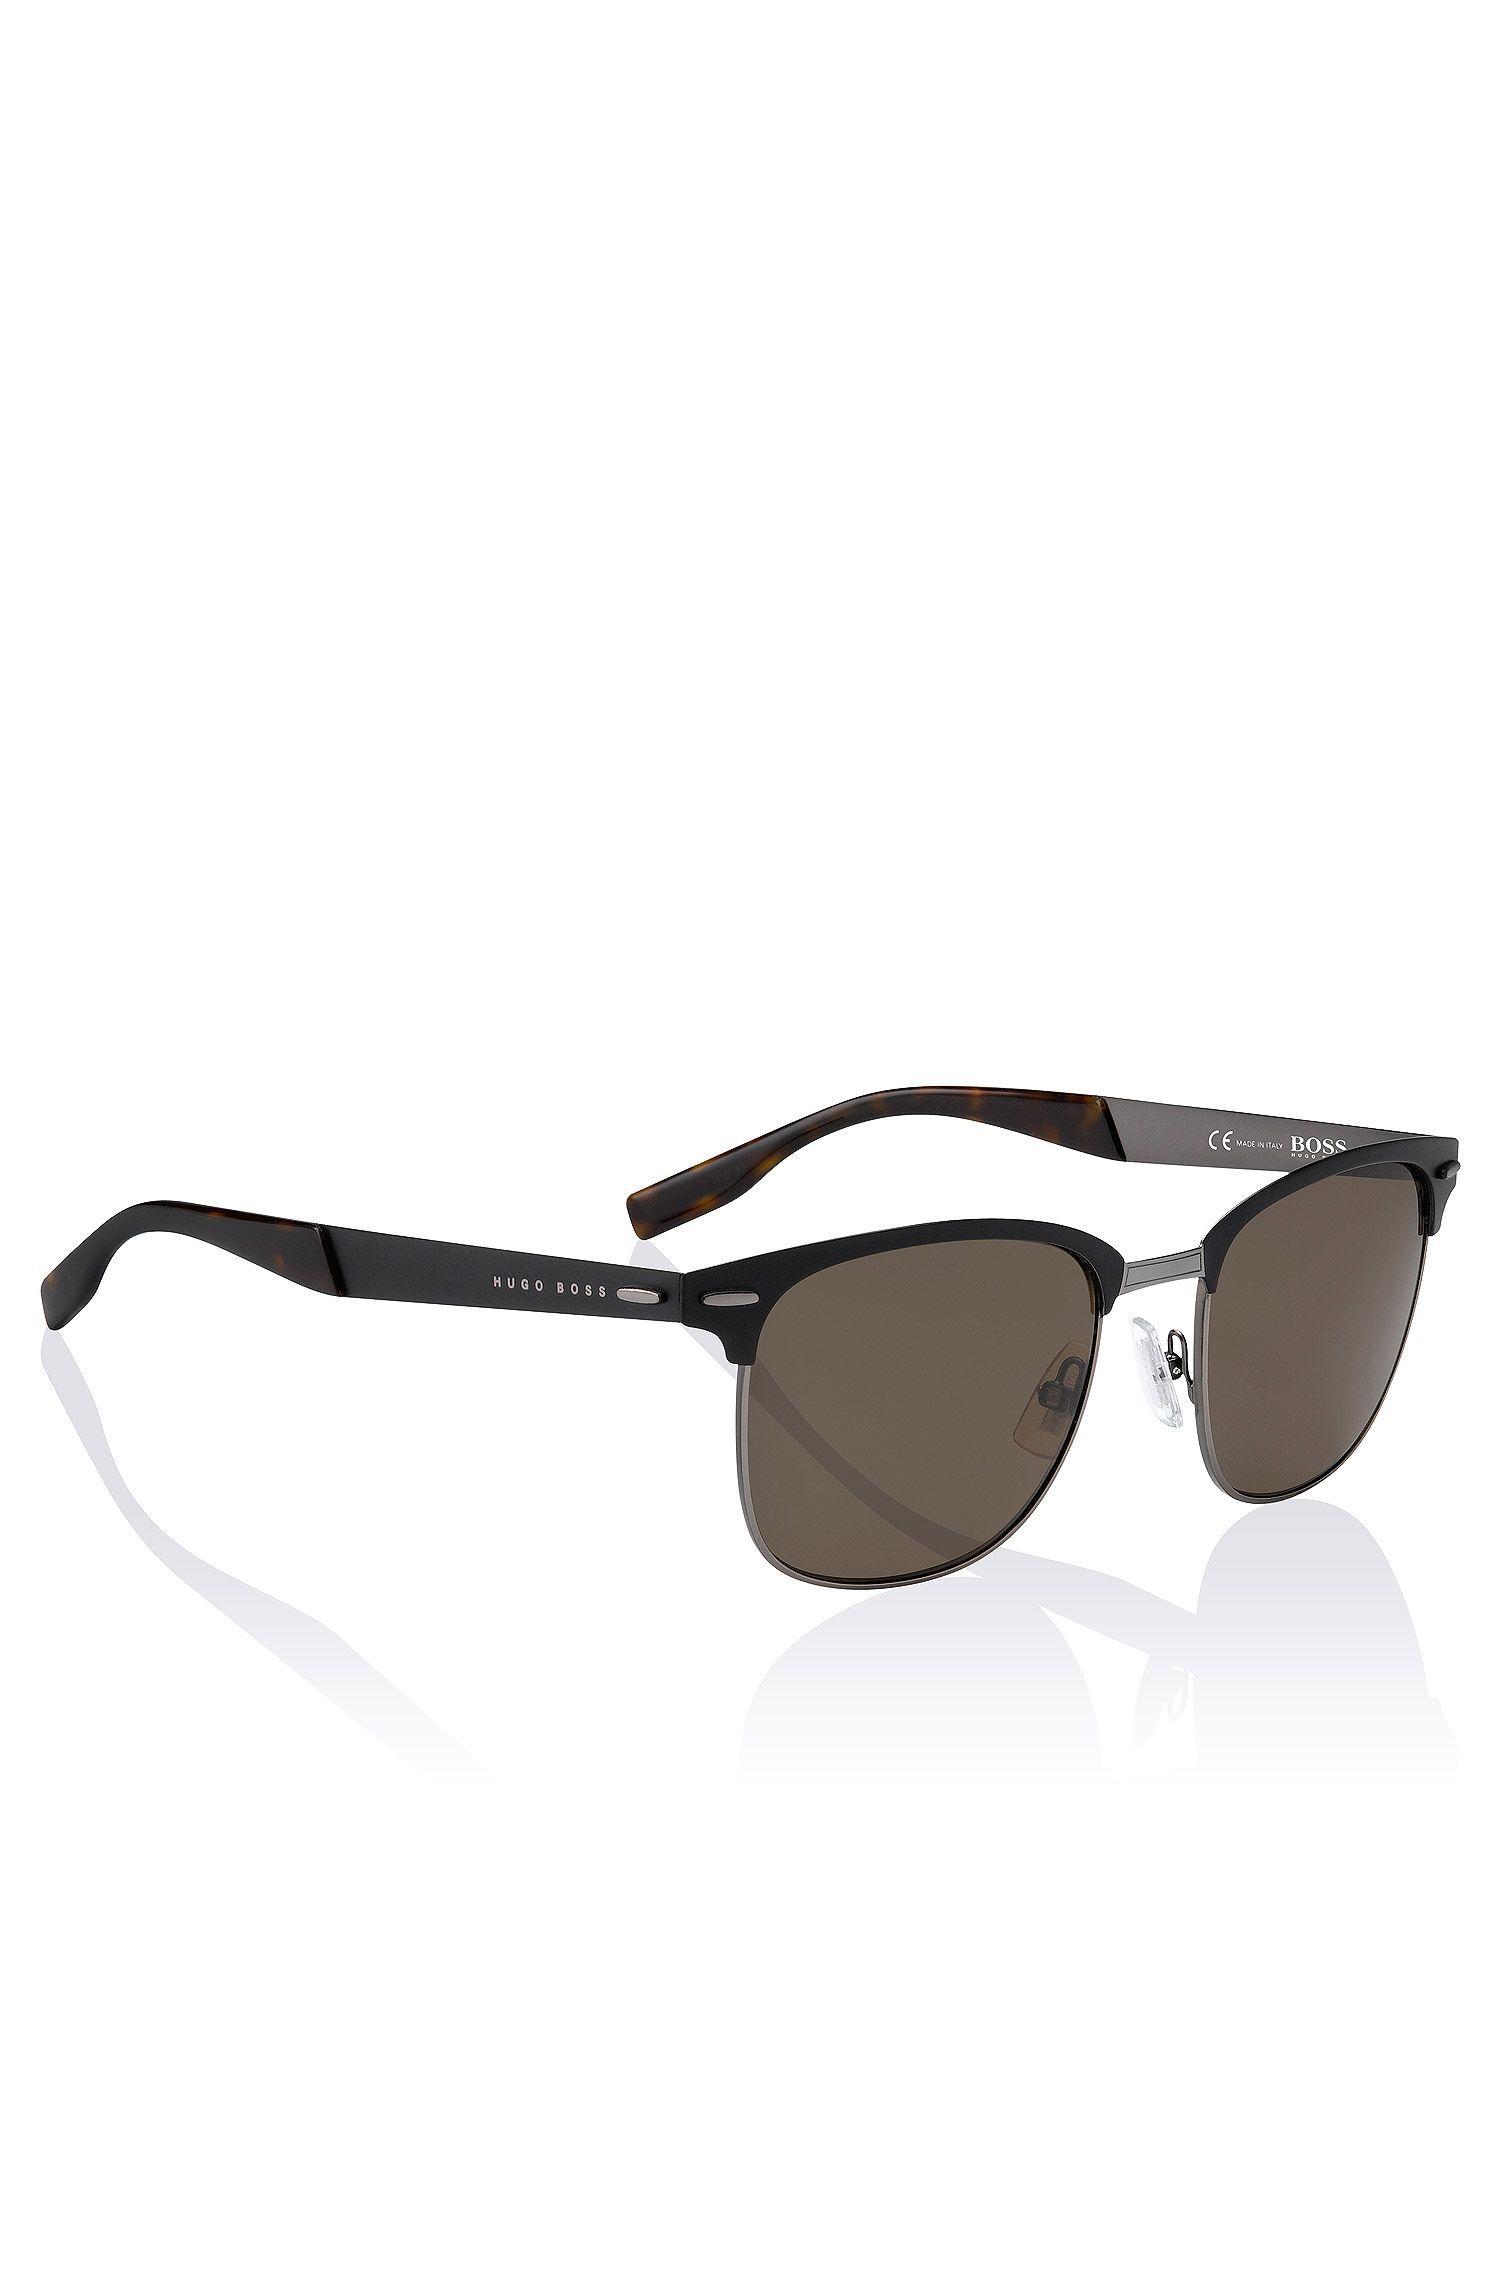 Sunglasses 'BOSS 0595/S'